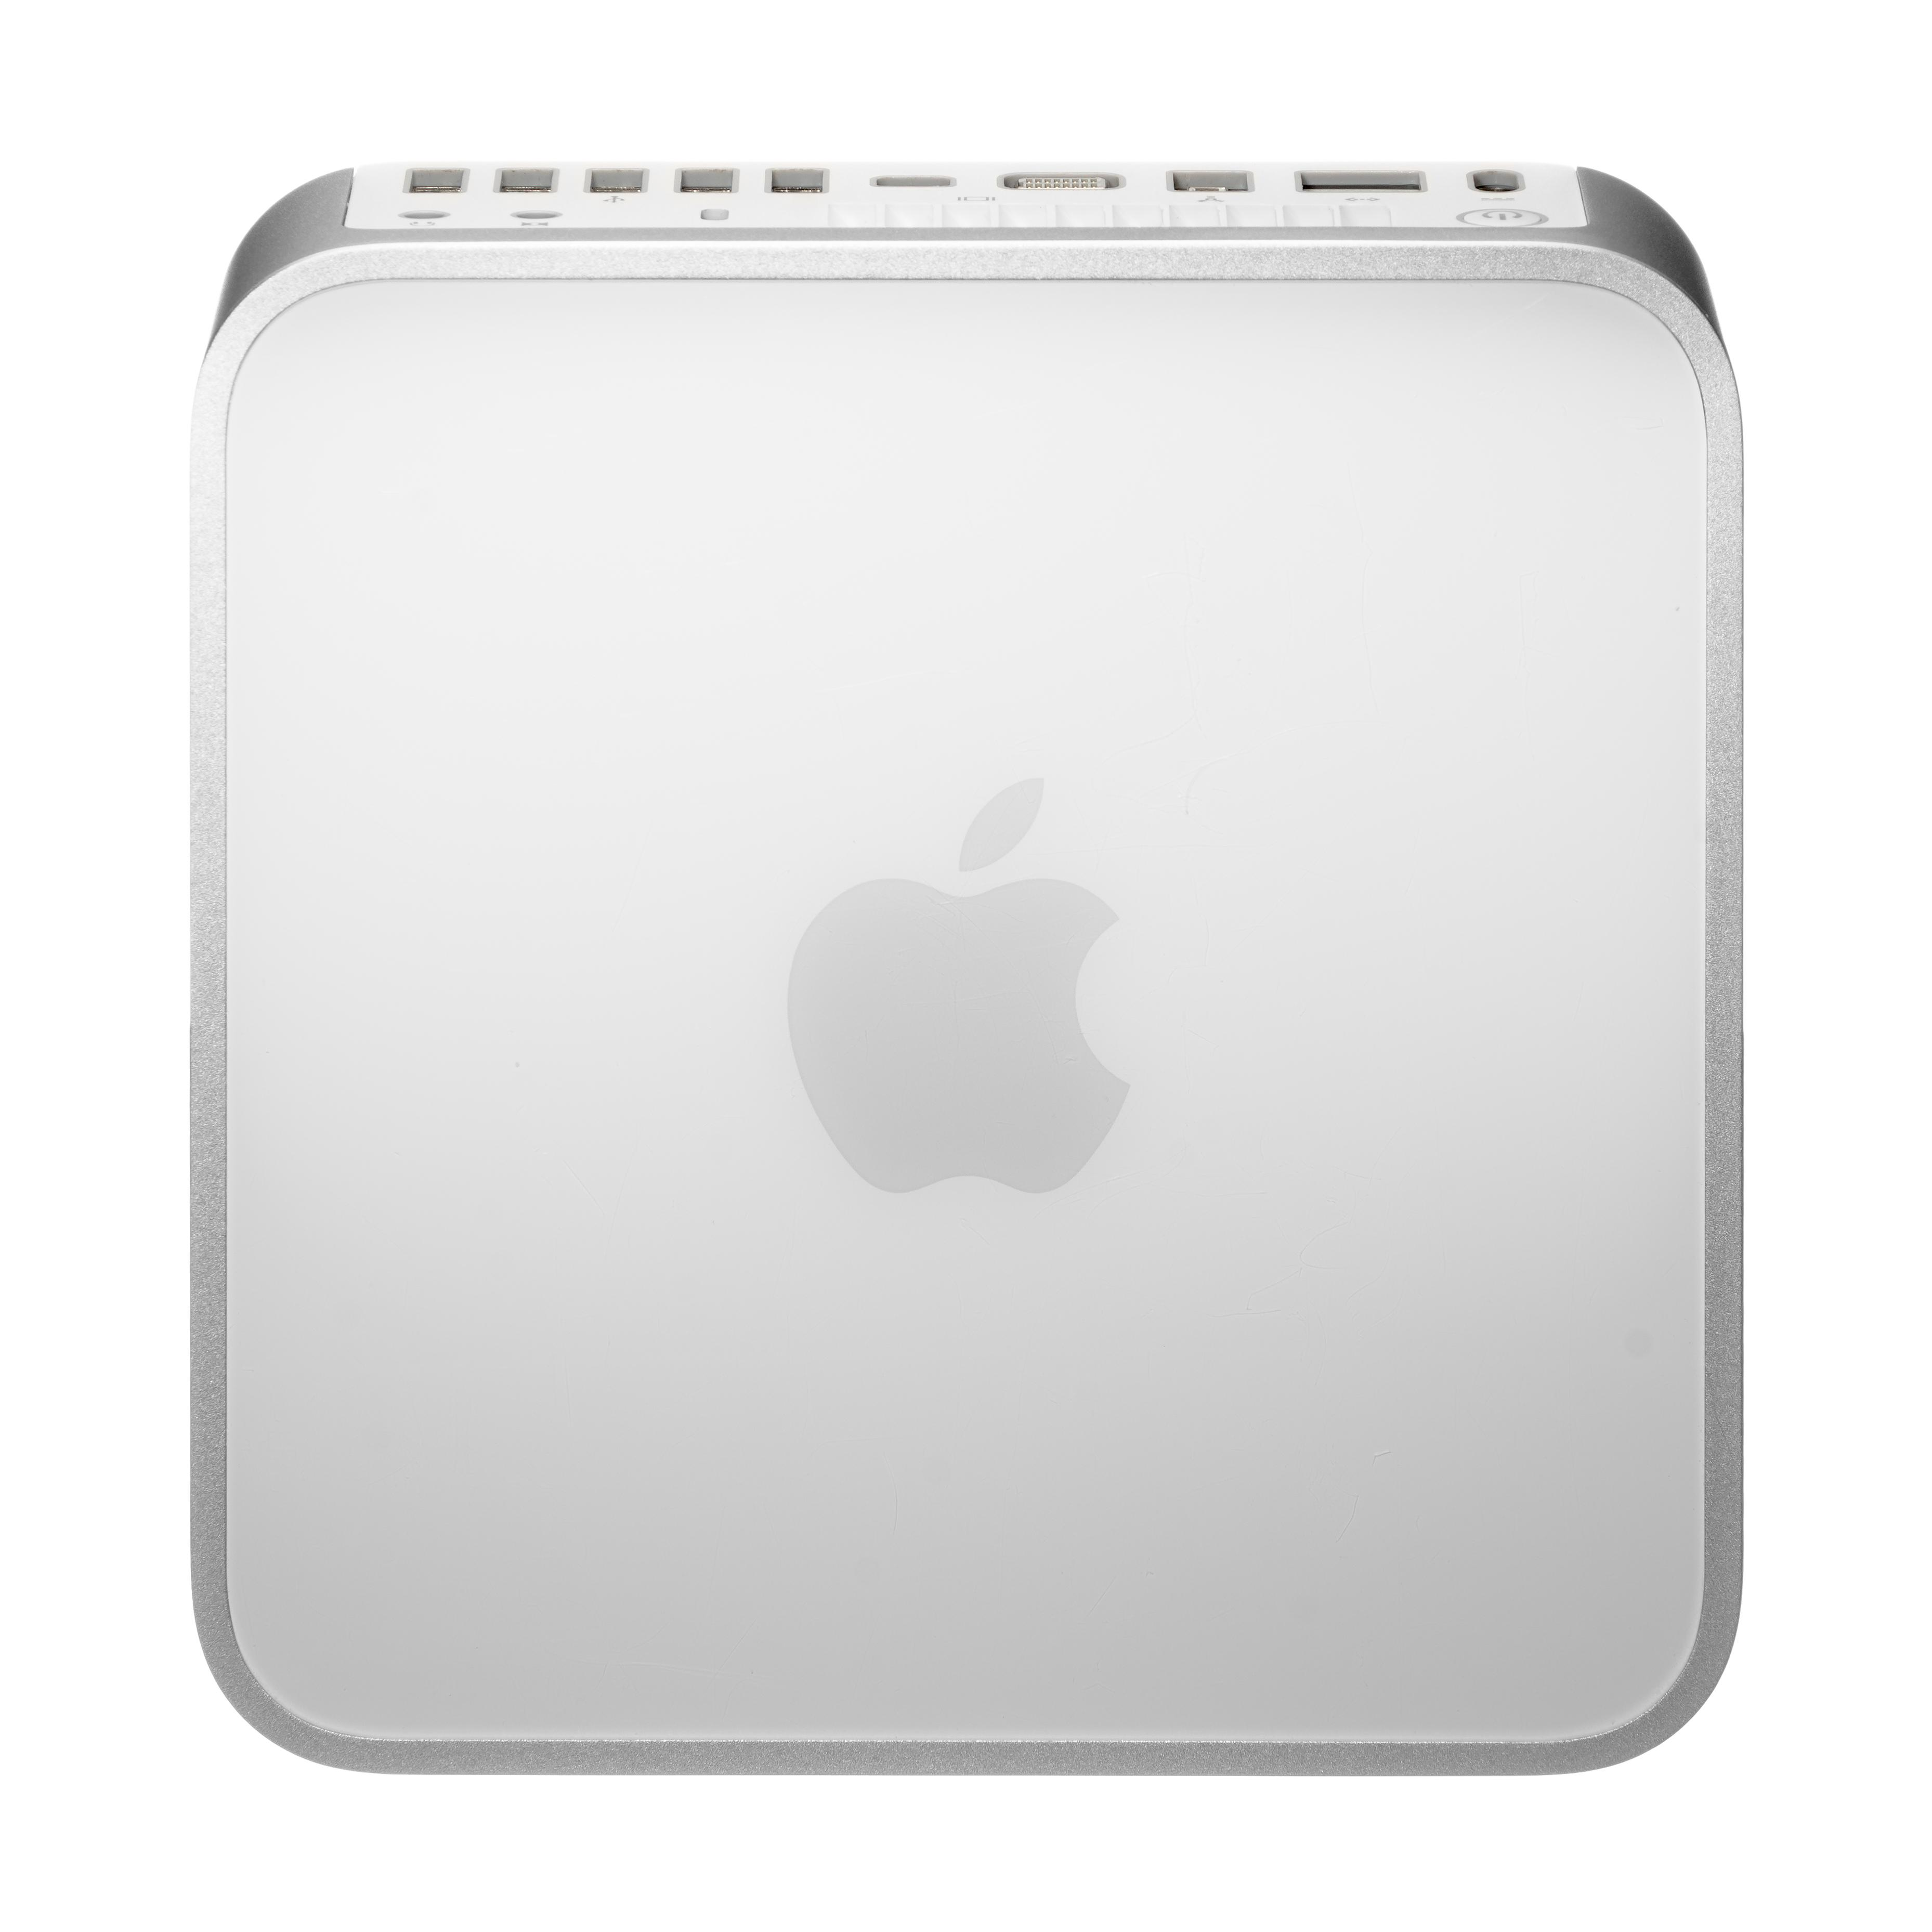 Mac mini  Core 2 Duo 2,26 GHz  - HDD 160 GB - 2GB